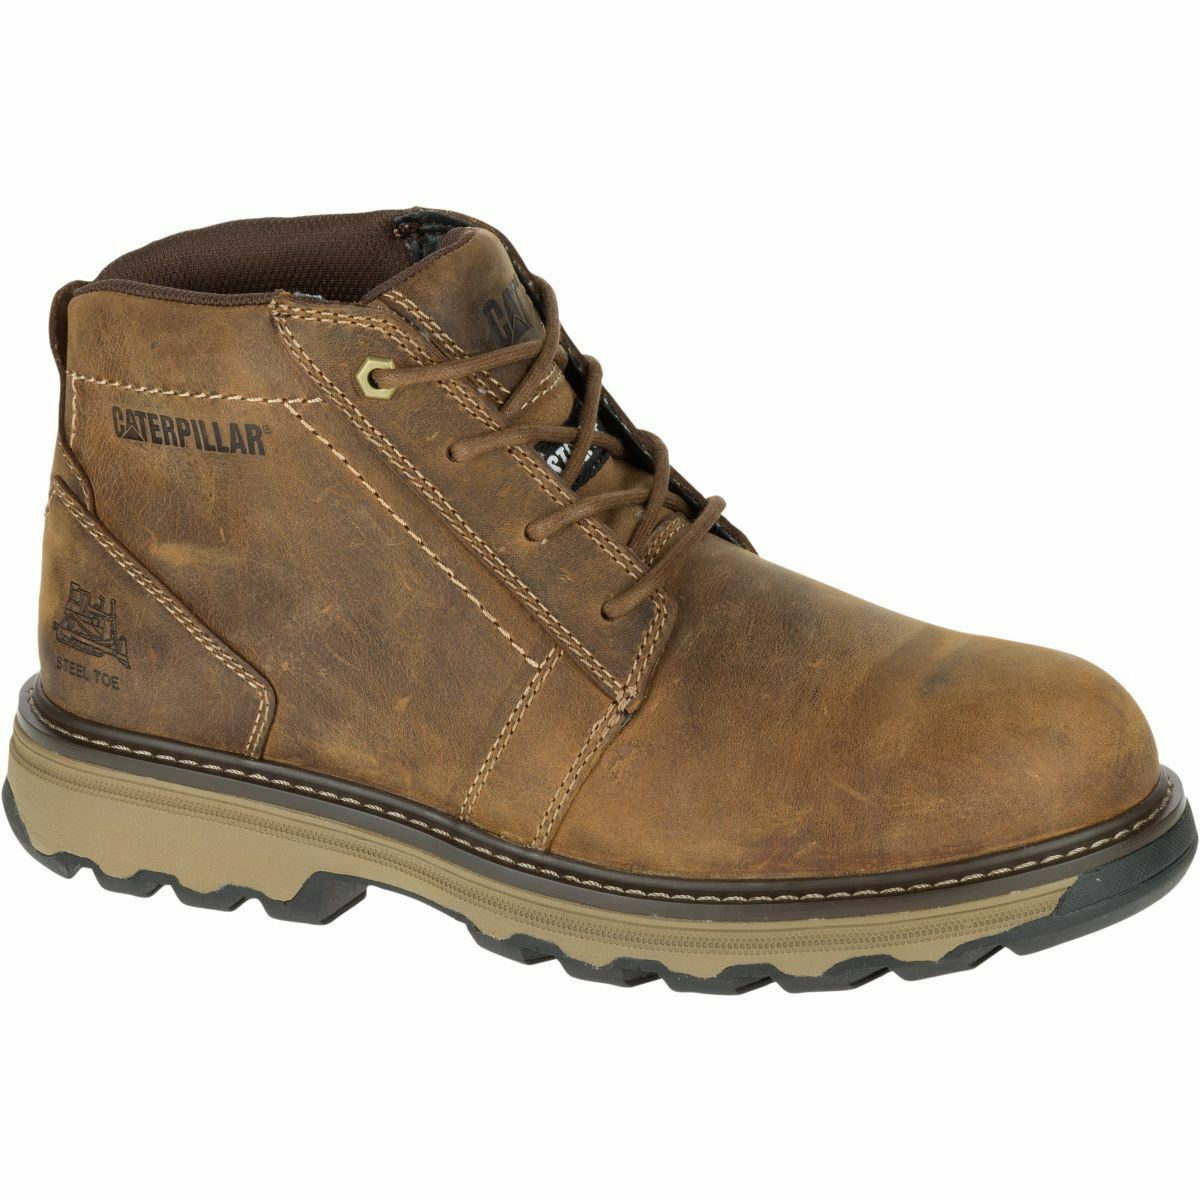 Caterpillar Boots Mens Parker Esd Steel Toe Dark Beige P90715